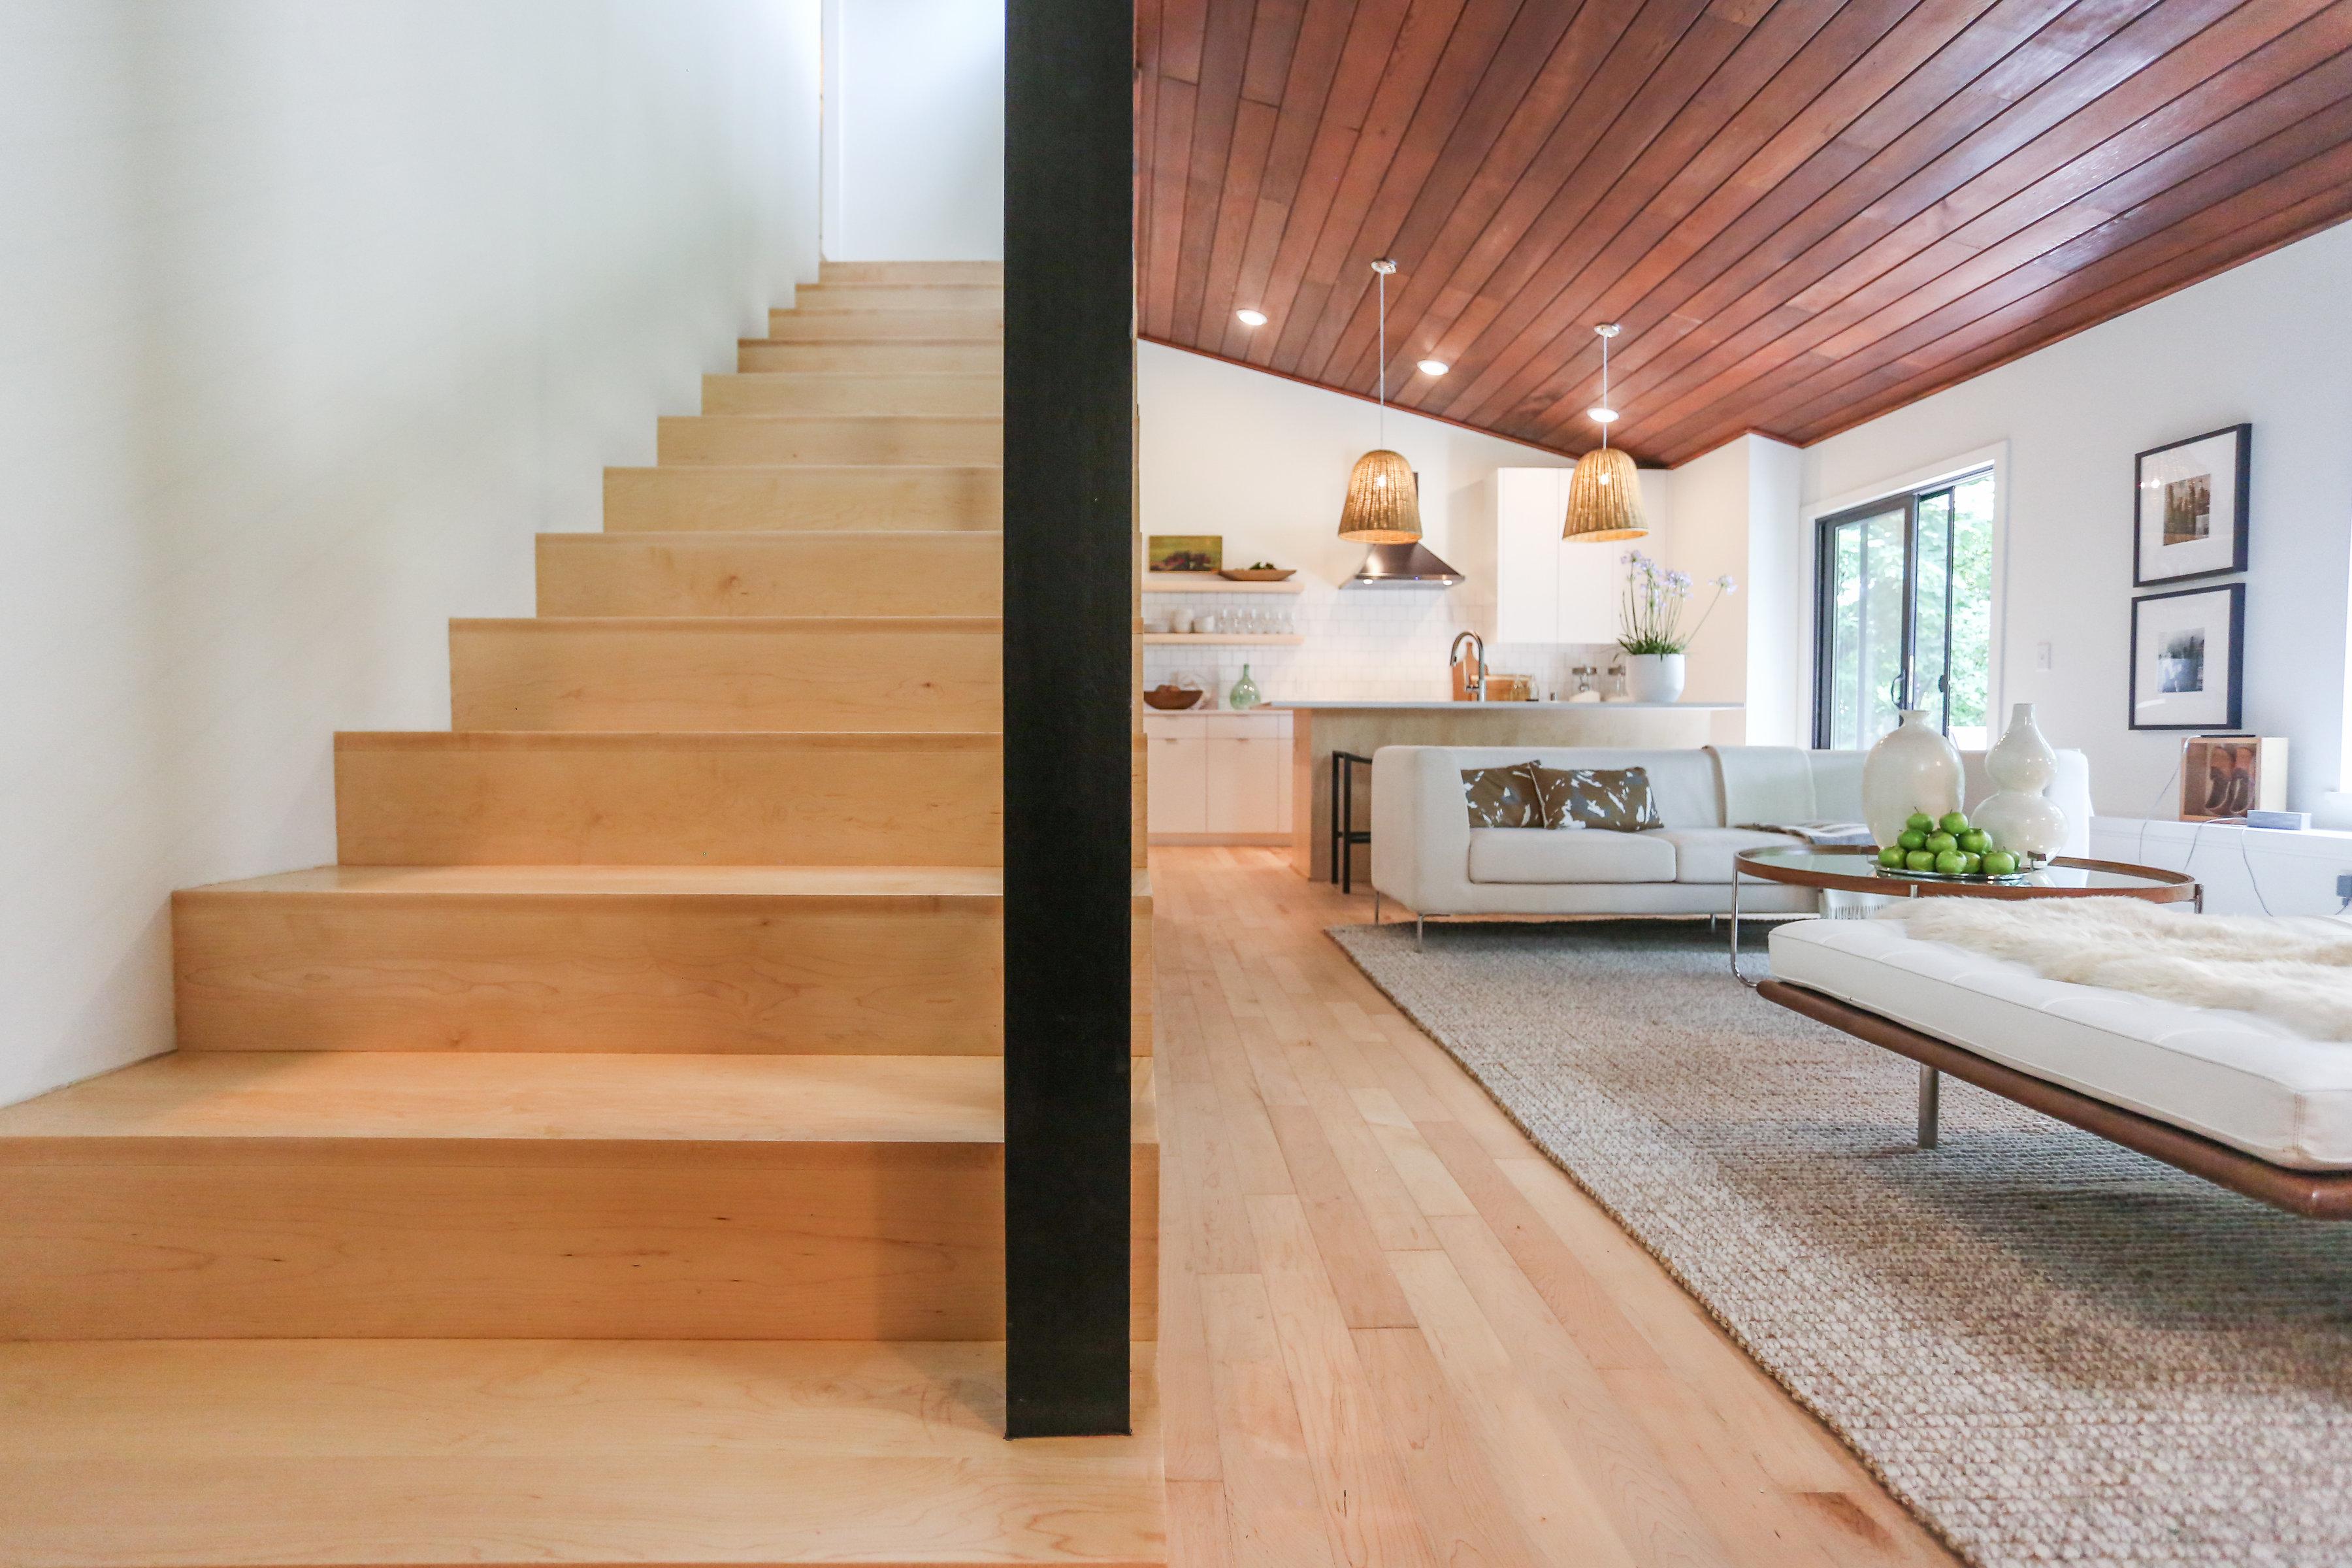 maple hardwood floor choosing between maple and oak hardwood floors | unique wood floors MBUGEQN